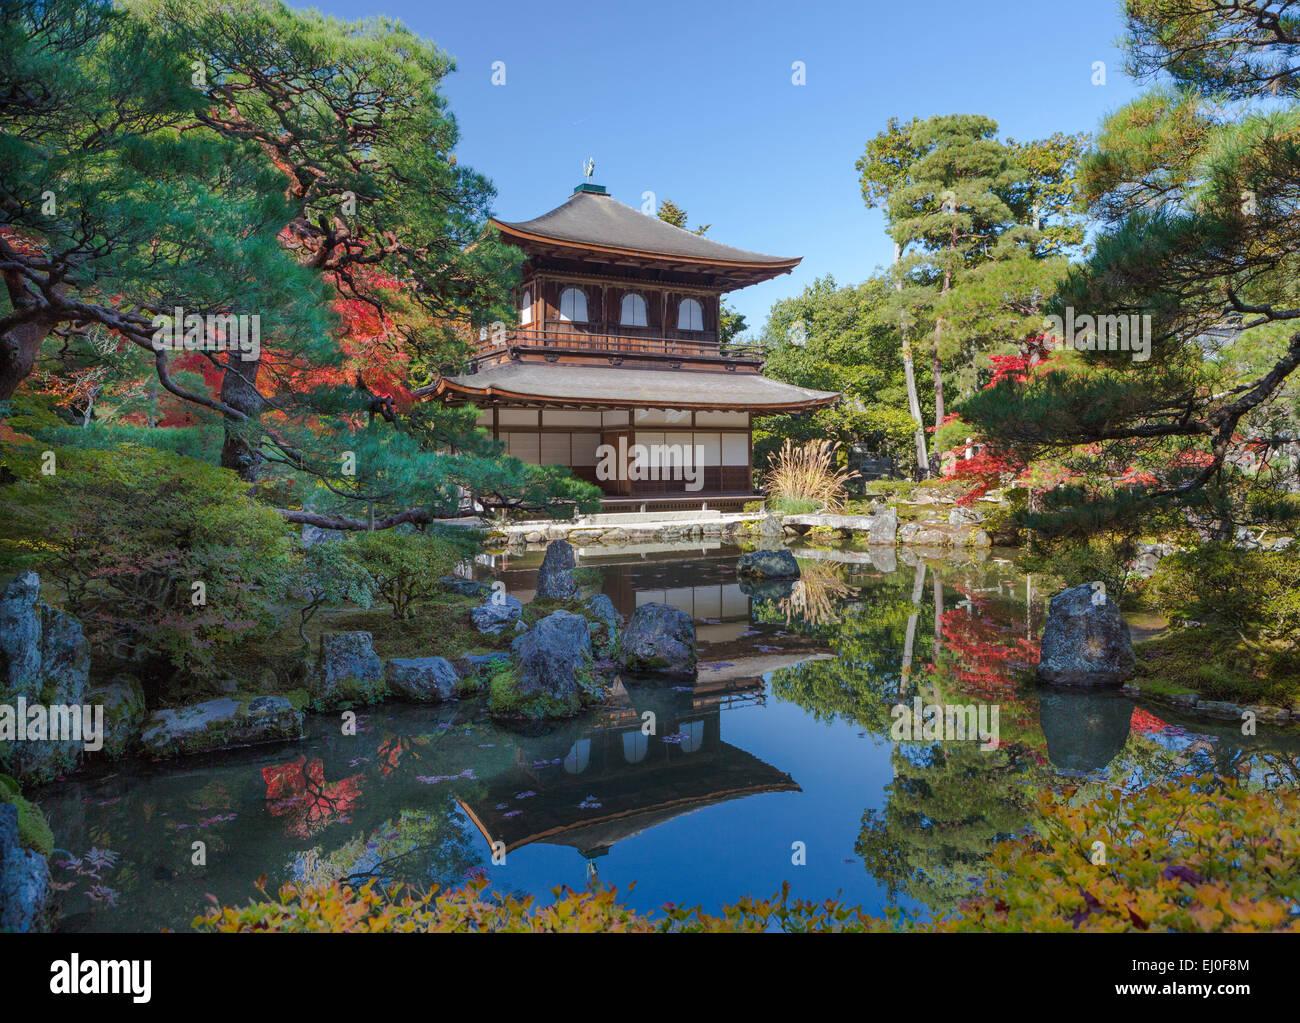 world heritage, Ginkaku-ji, Japan, Asia, Kansai, Kyoto, Japanese, Landscape, architecture, colourful, fall, garden, - Stock Image